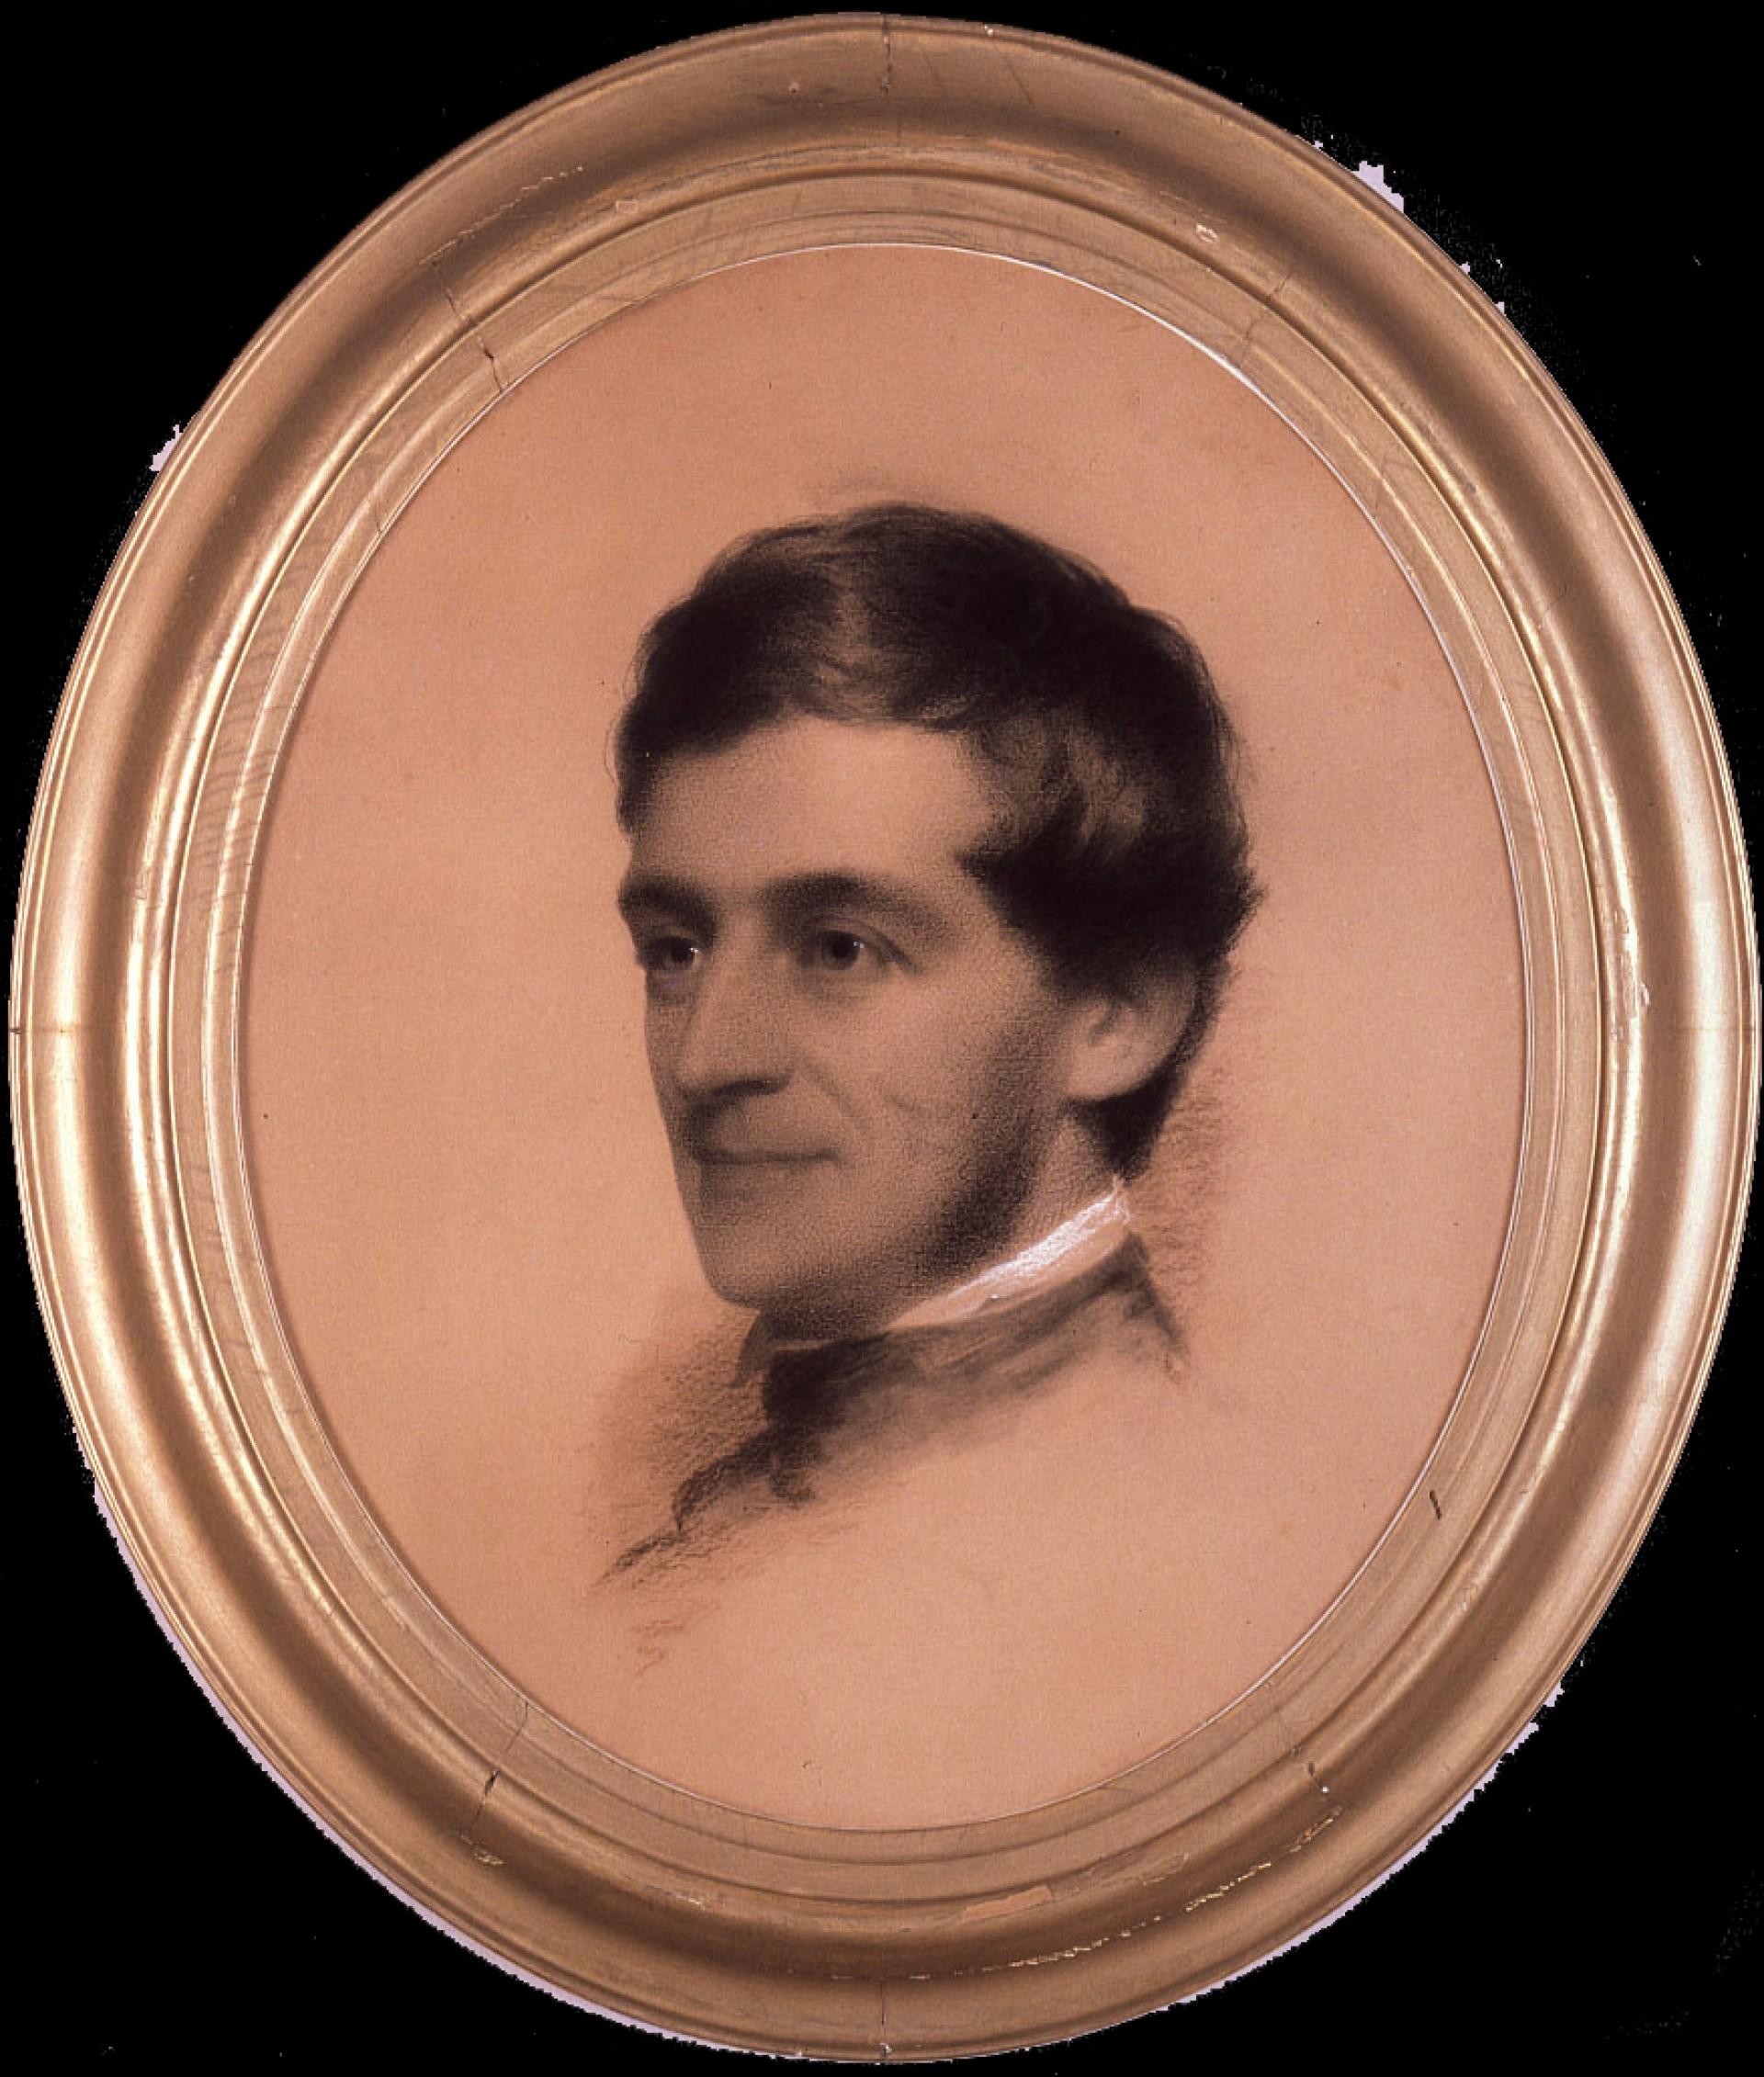 014 Self Reliance And Other Essays Emerson By Johnson 1846 Essay Formidable Ralph Waldo Pdf Ekşi 1920